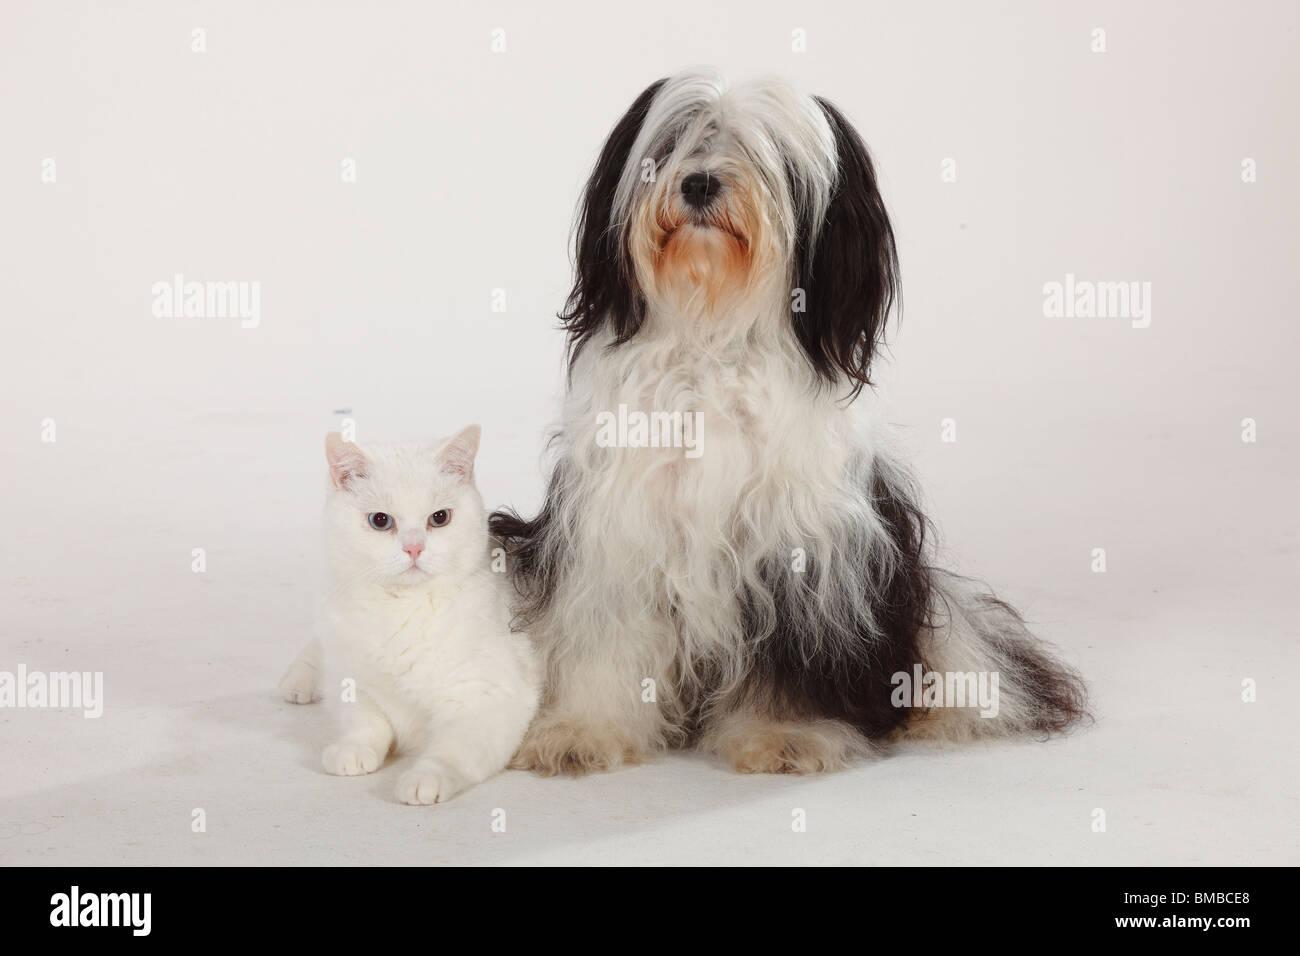 British Shorthair Cat Tomcat White Blue Eyed Tibetan Terrier Stock Photo Alamy